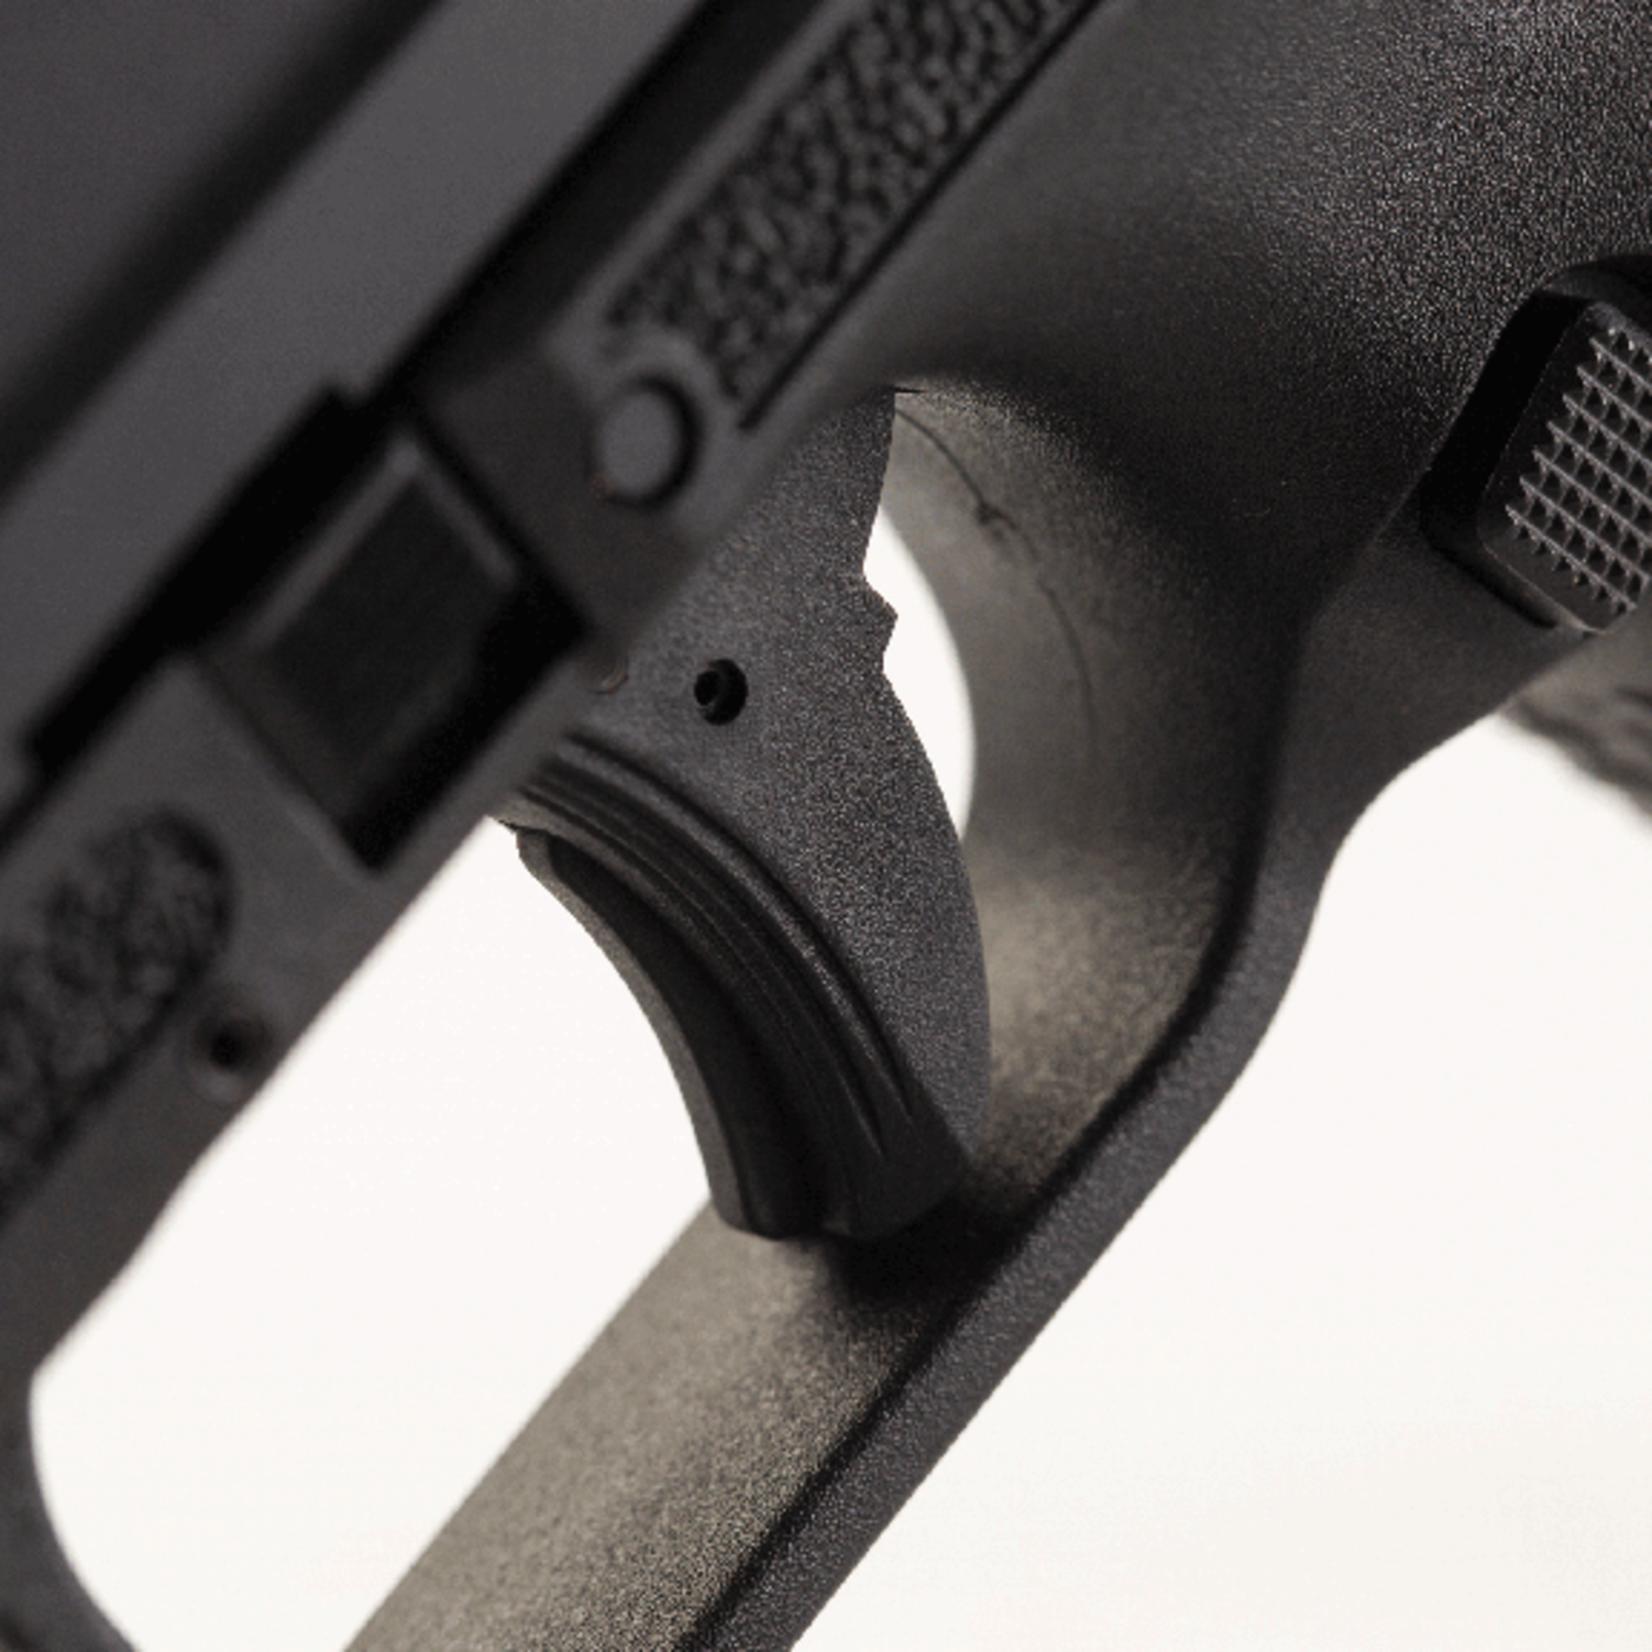 Canik TP9SA Mod.2 9mm 2 Magazines & Holster